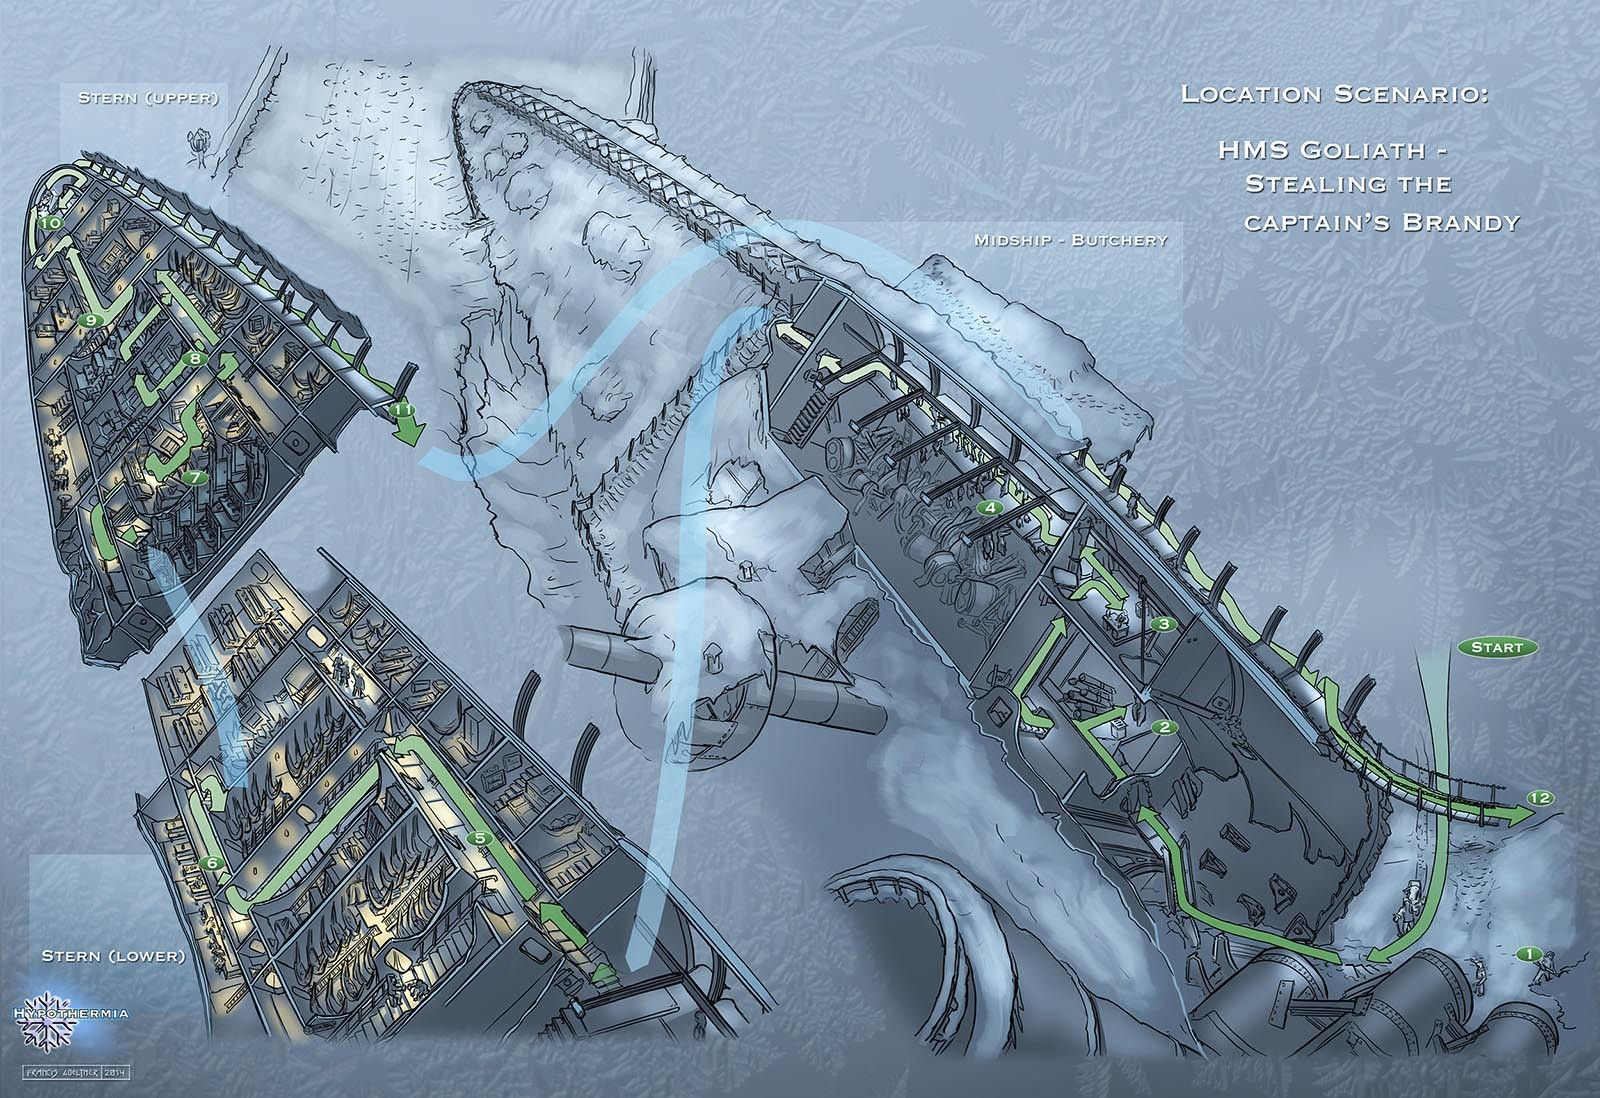 Francis goeltner francisgoeltner hypothermia 10 gameplay01 s